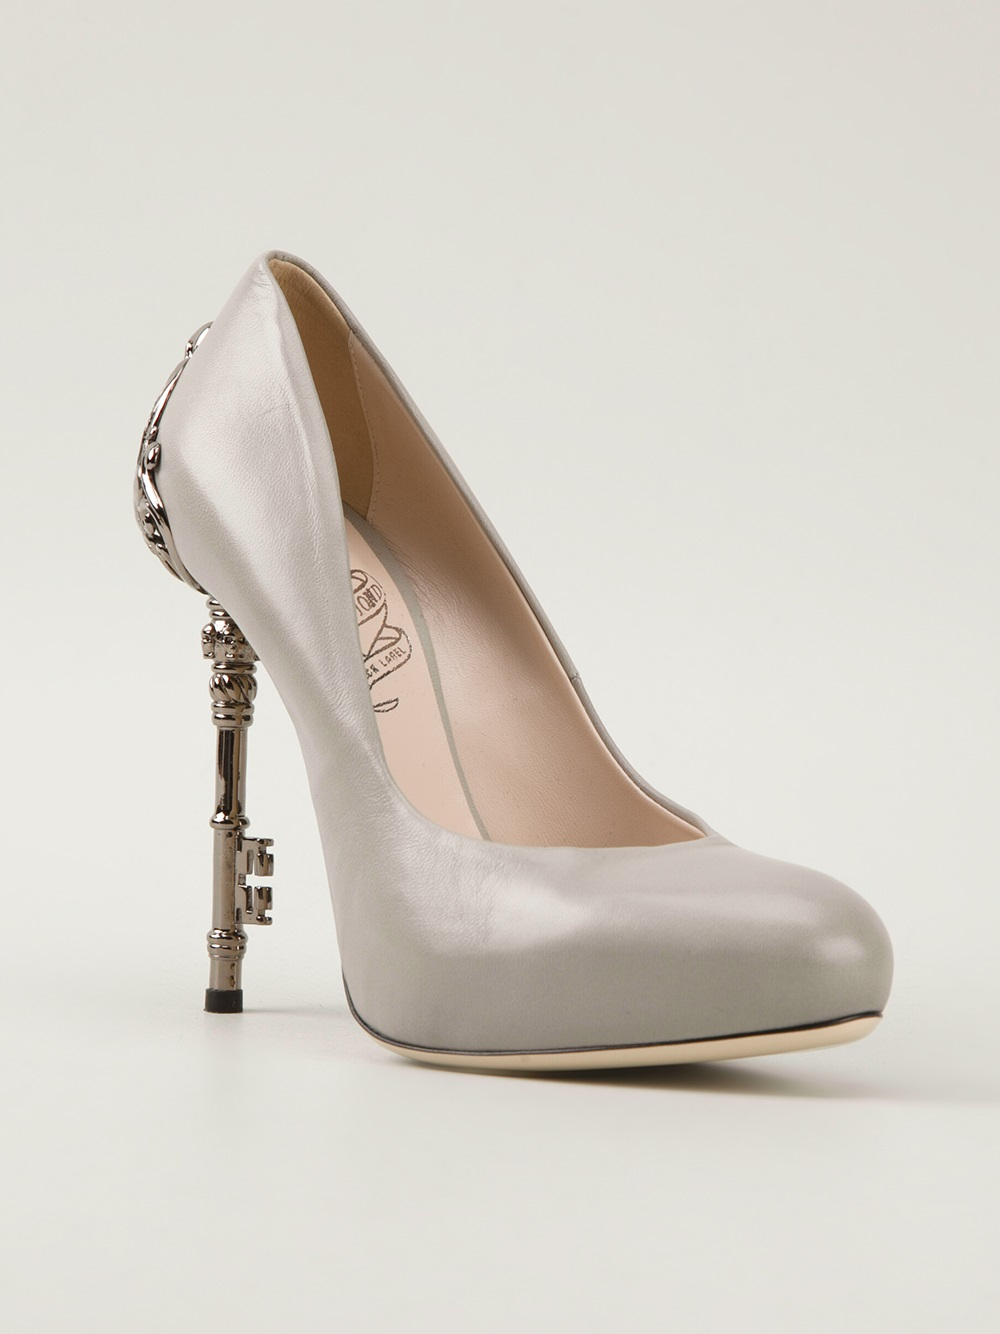 a66e23419904 Lyst - John Richmond Black Label Embellished Heel Pump in Gray